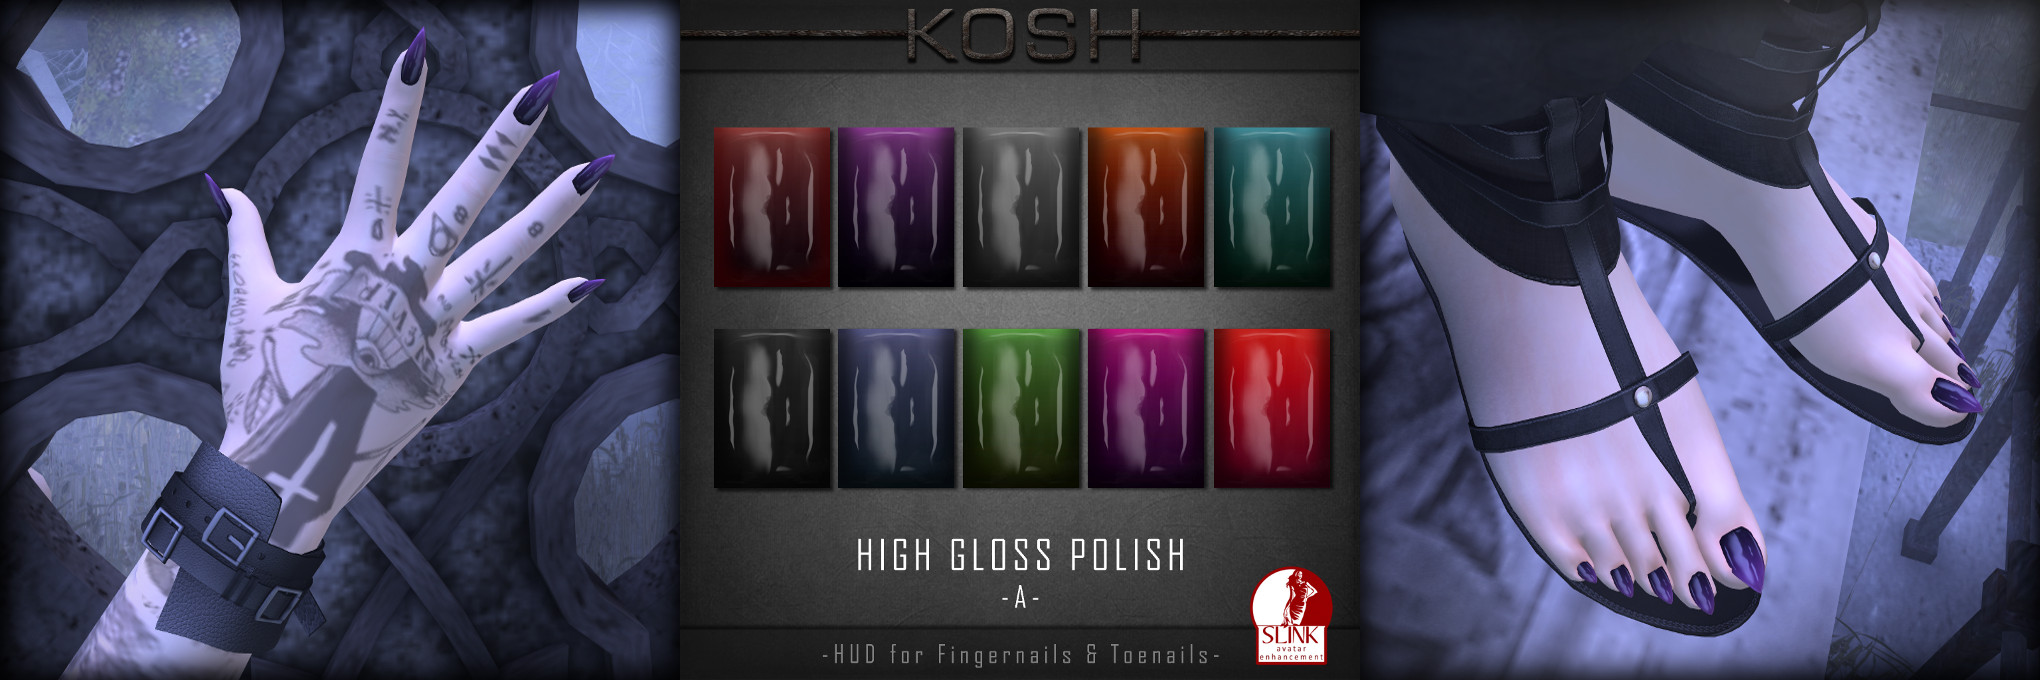 KOSH- HIGH GLOSS POLISH NAILS VPIC